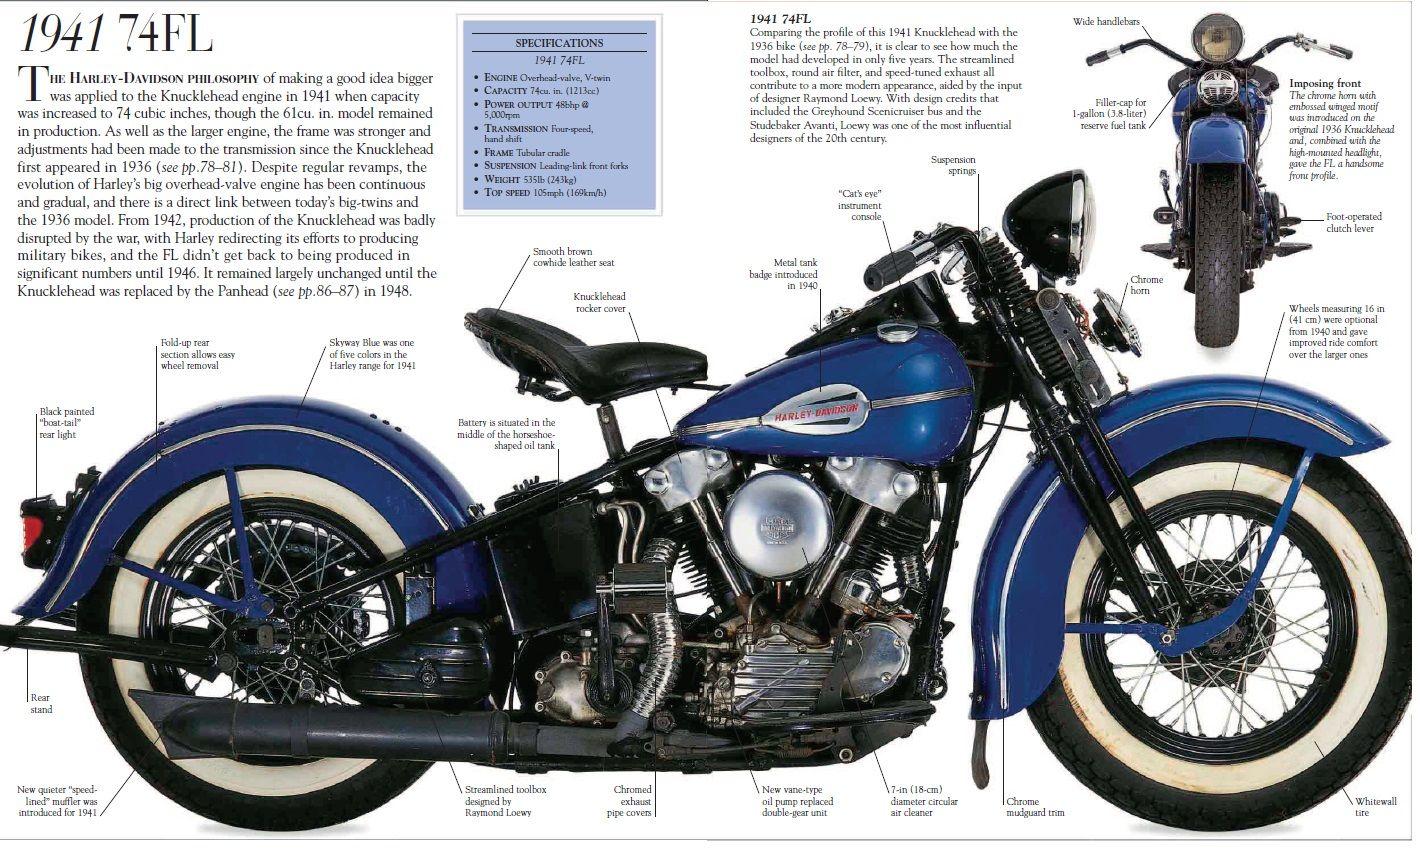 Pin By Maarten On Harley Davidson Motorcycle Harley Harley Knucklehead Harley Davidson Knucklehead